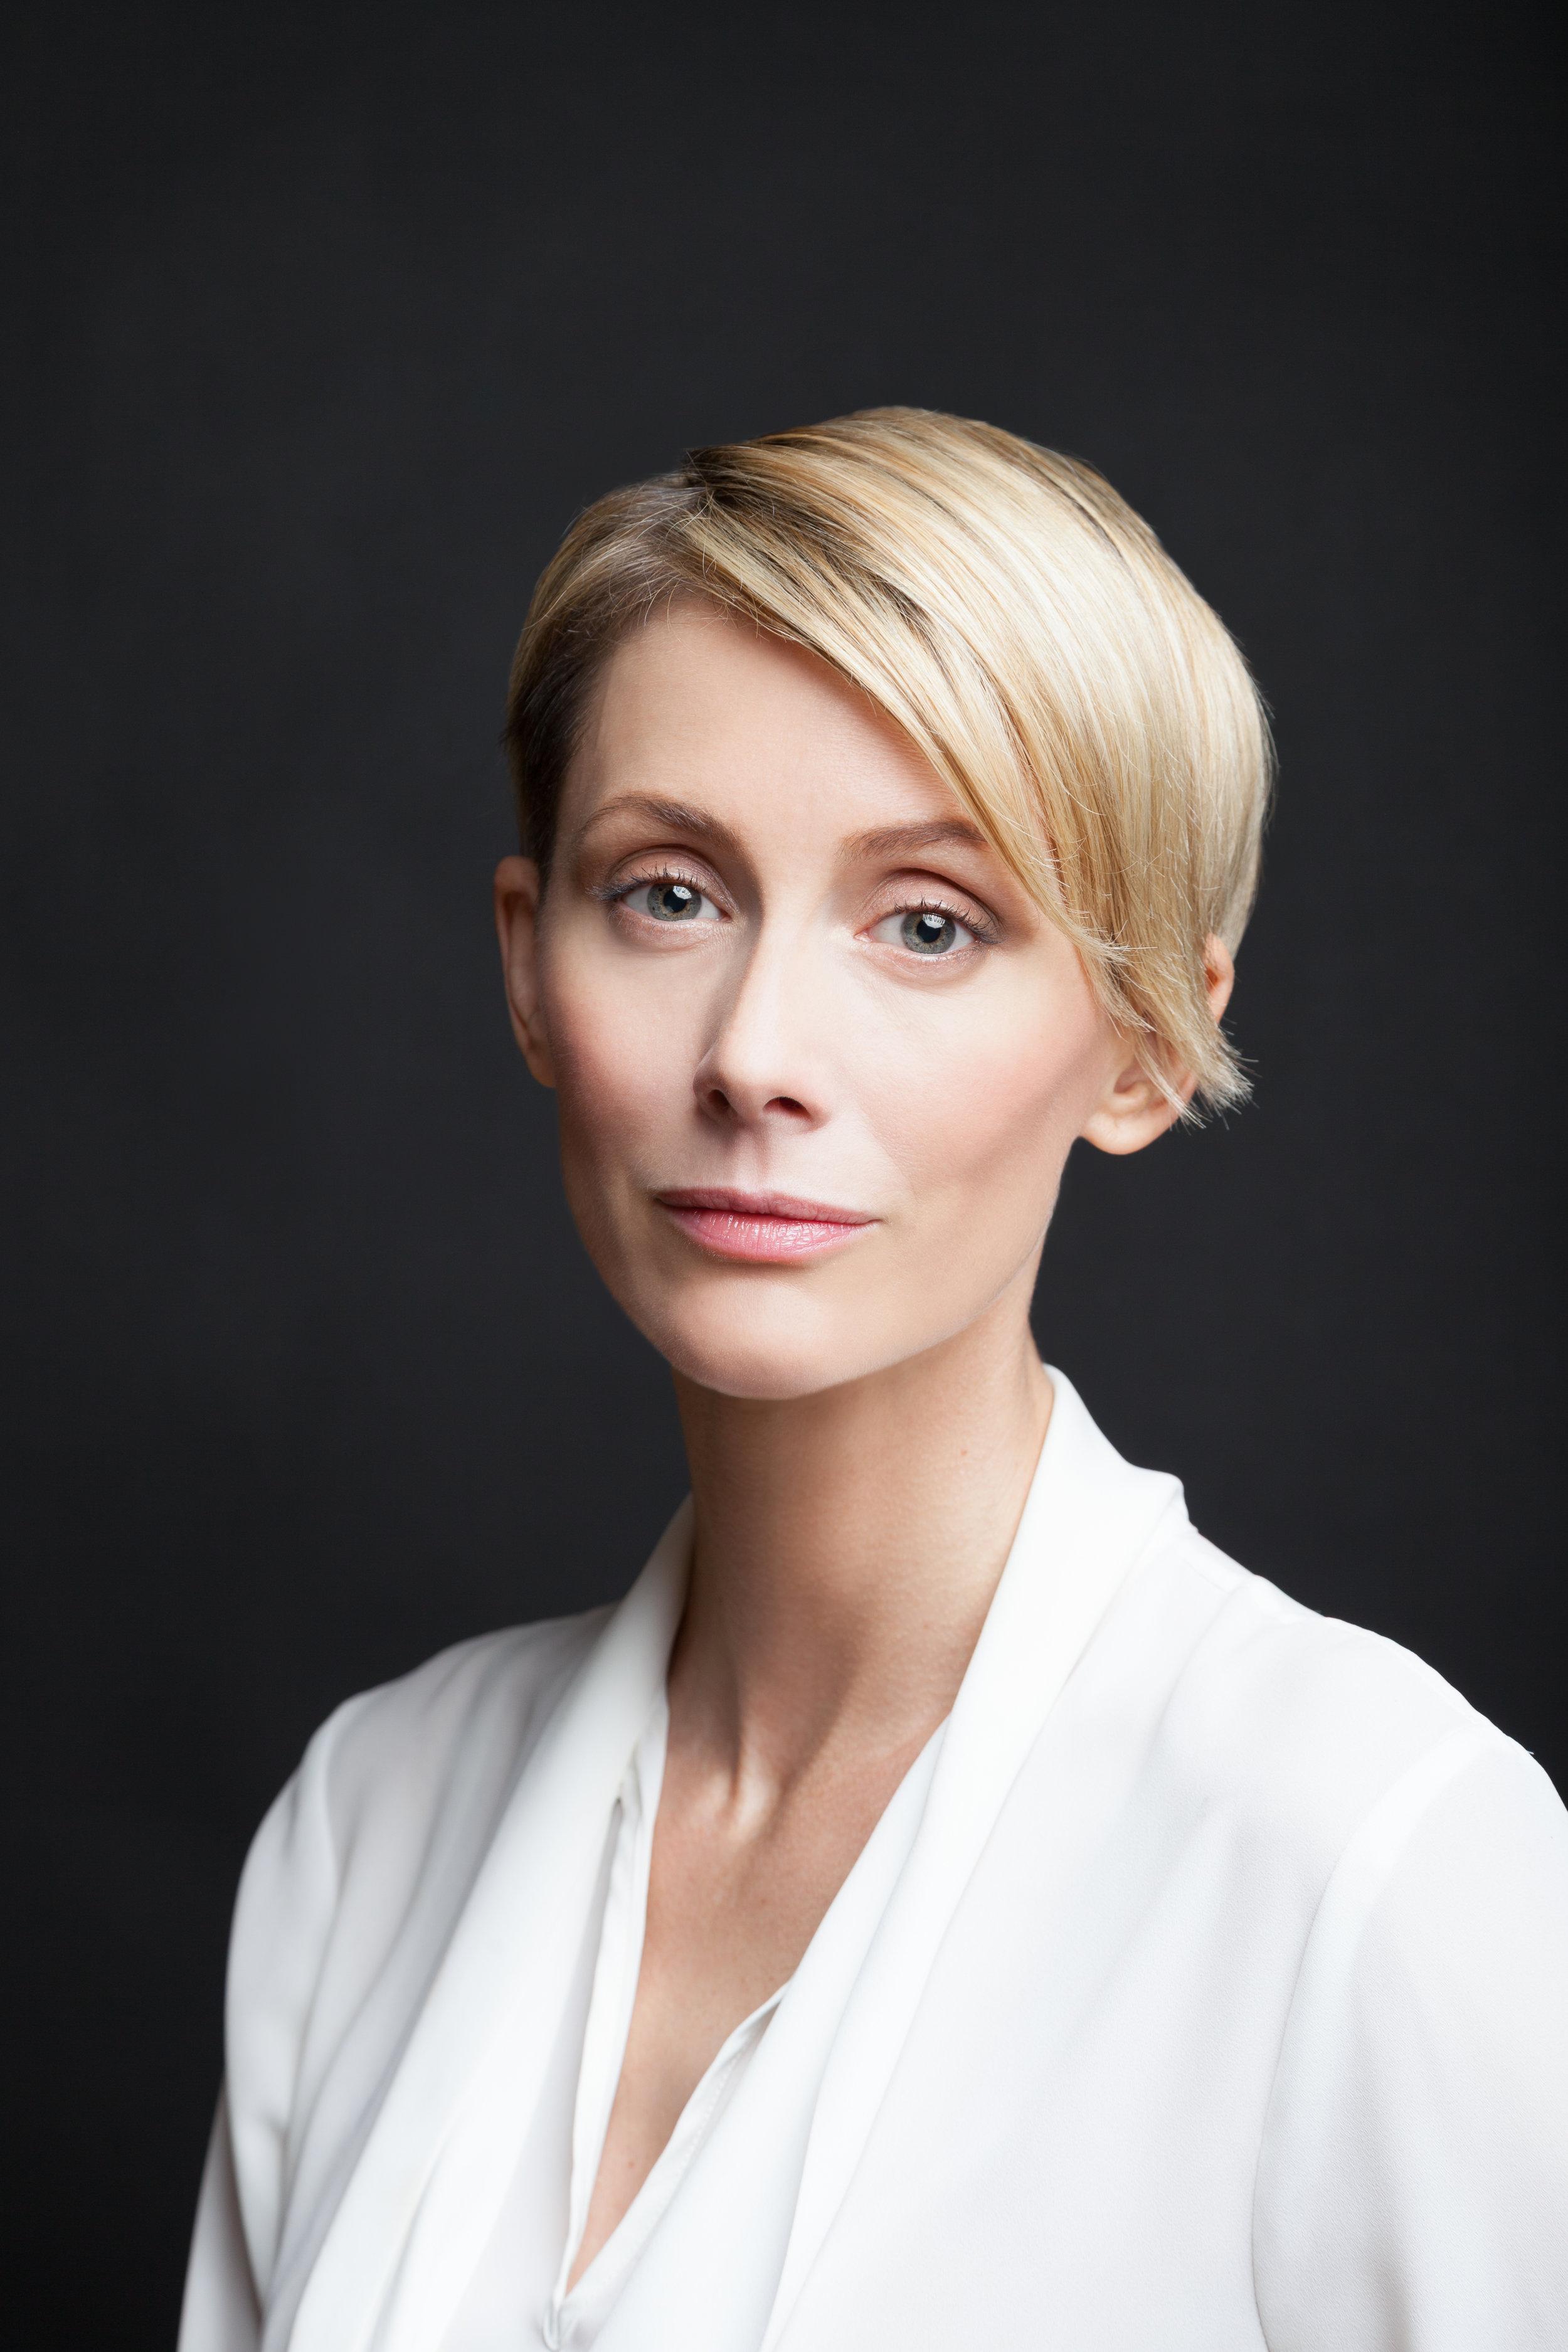 Erika Walter - Actor, Writer, Producer